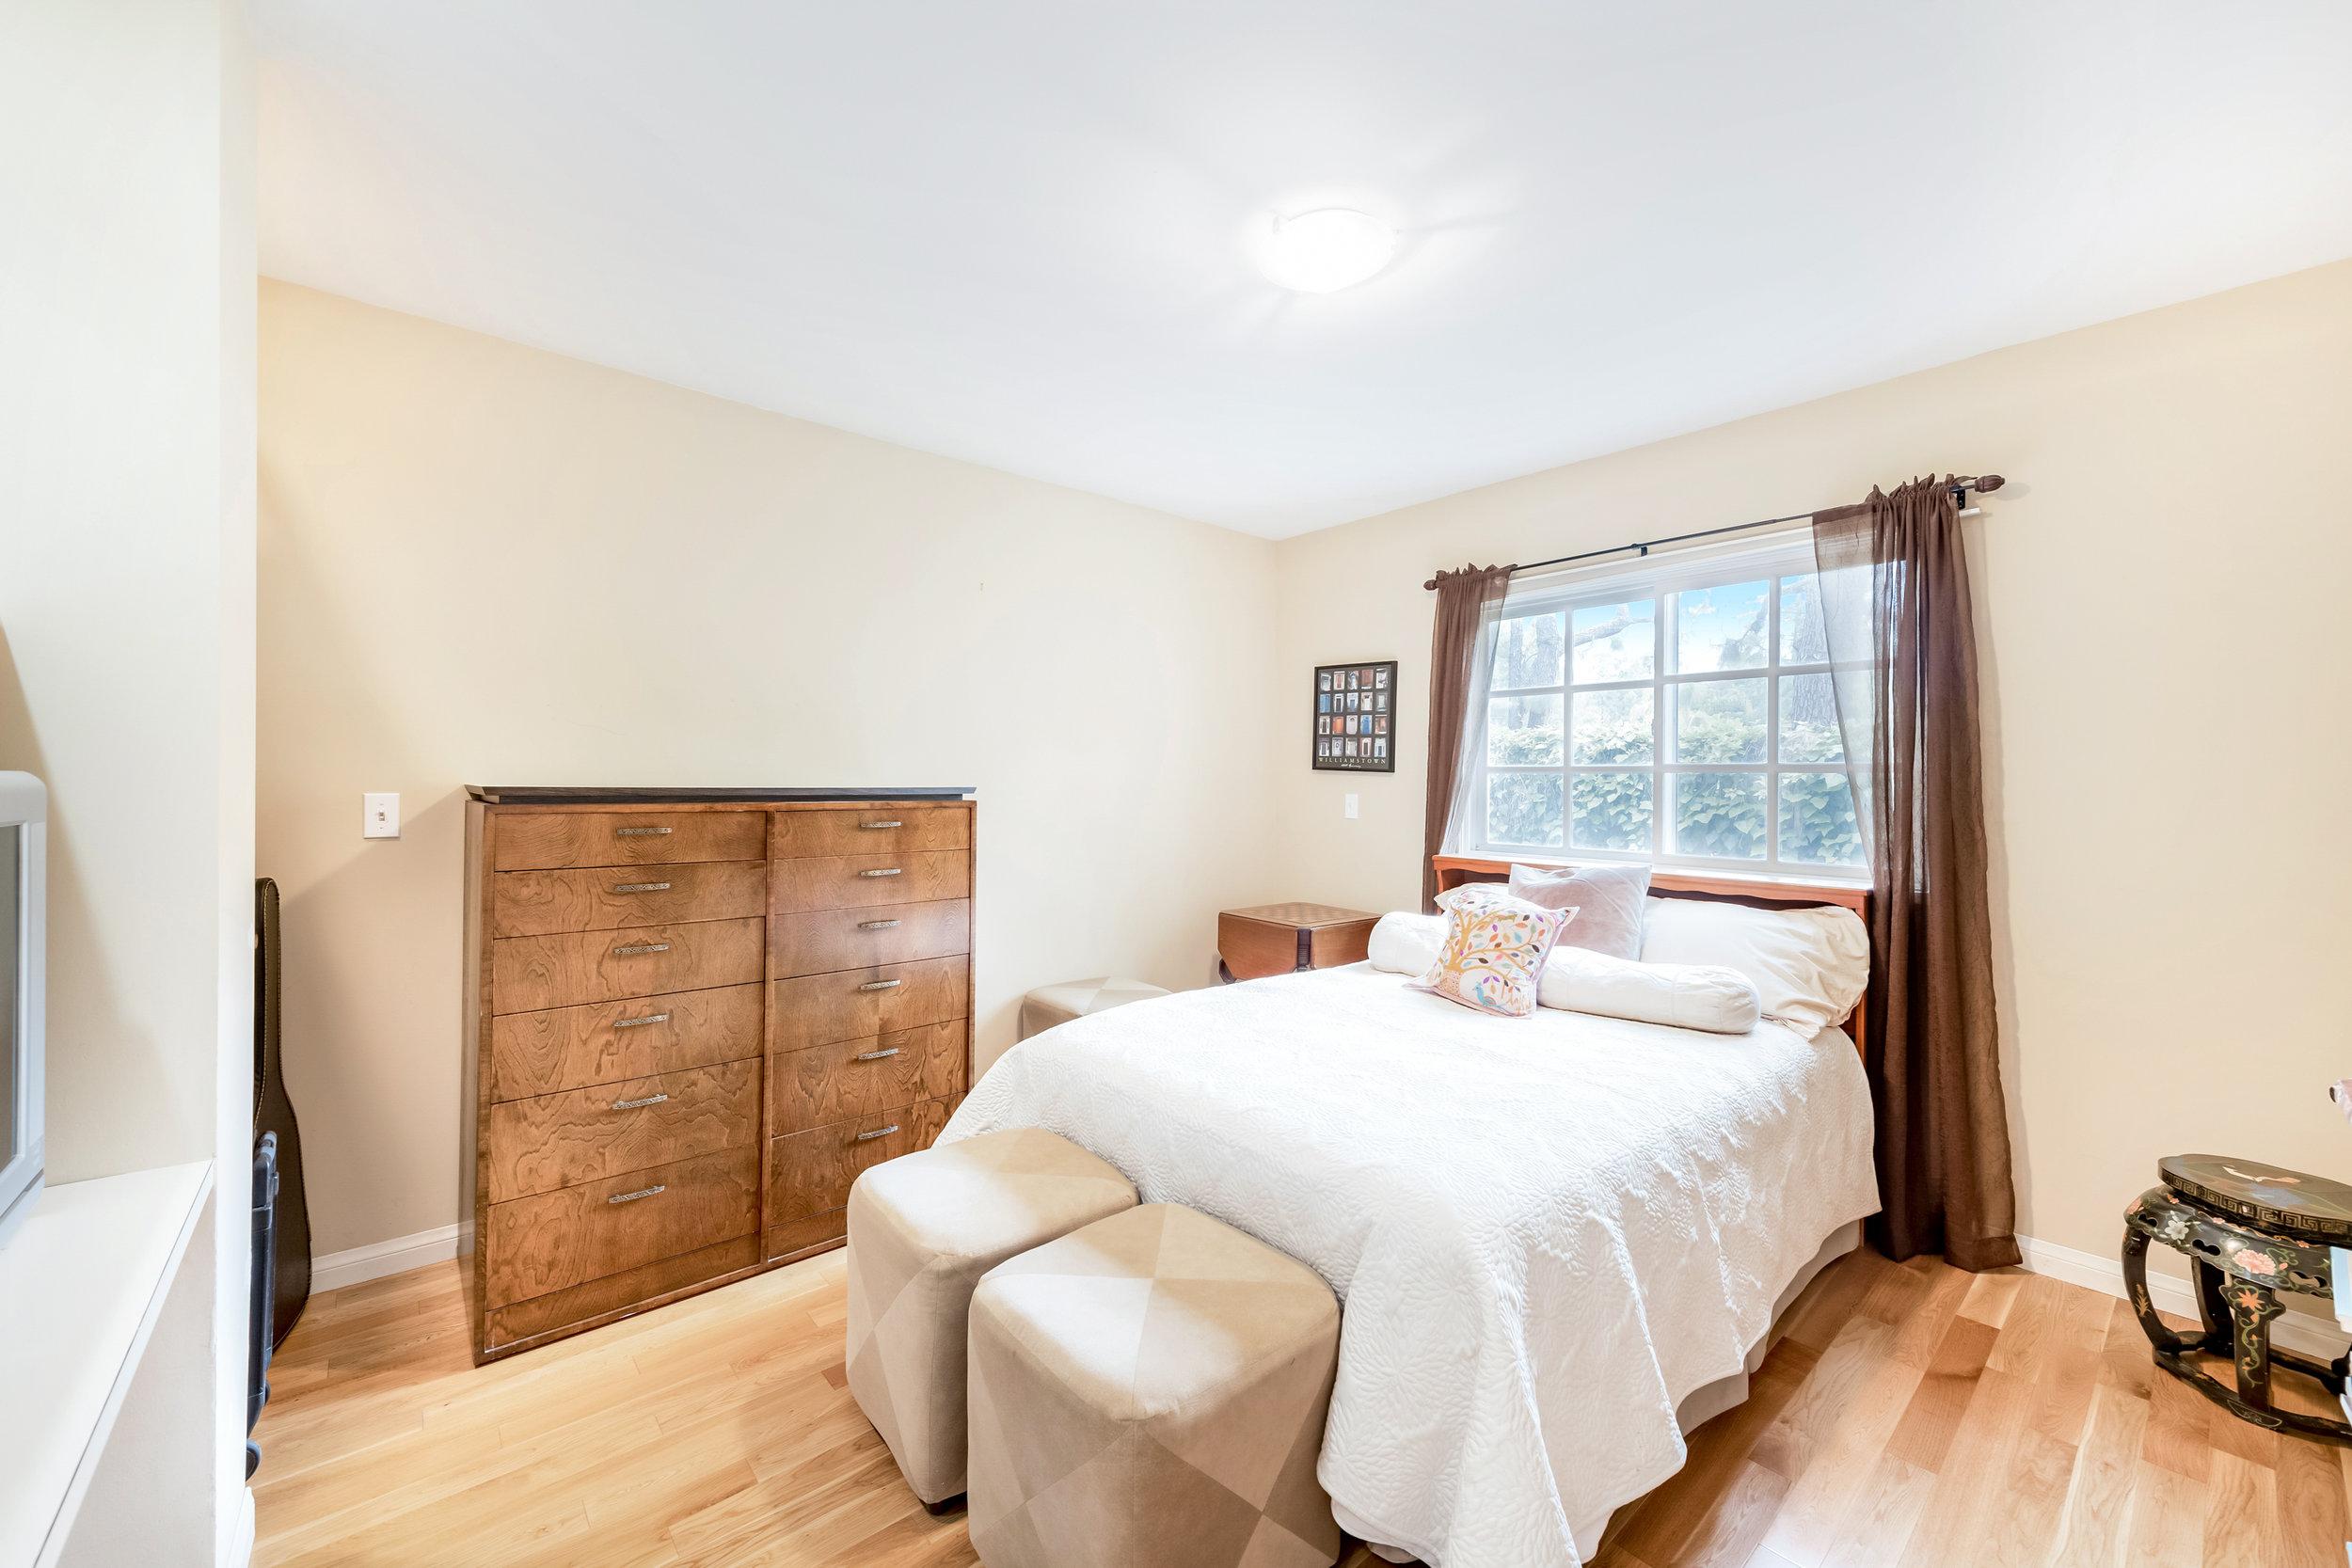 27 Bedroom 3.jpg